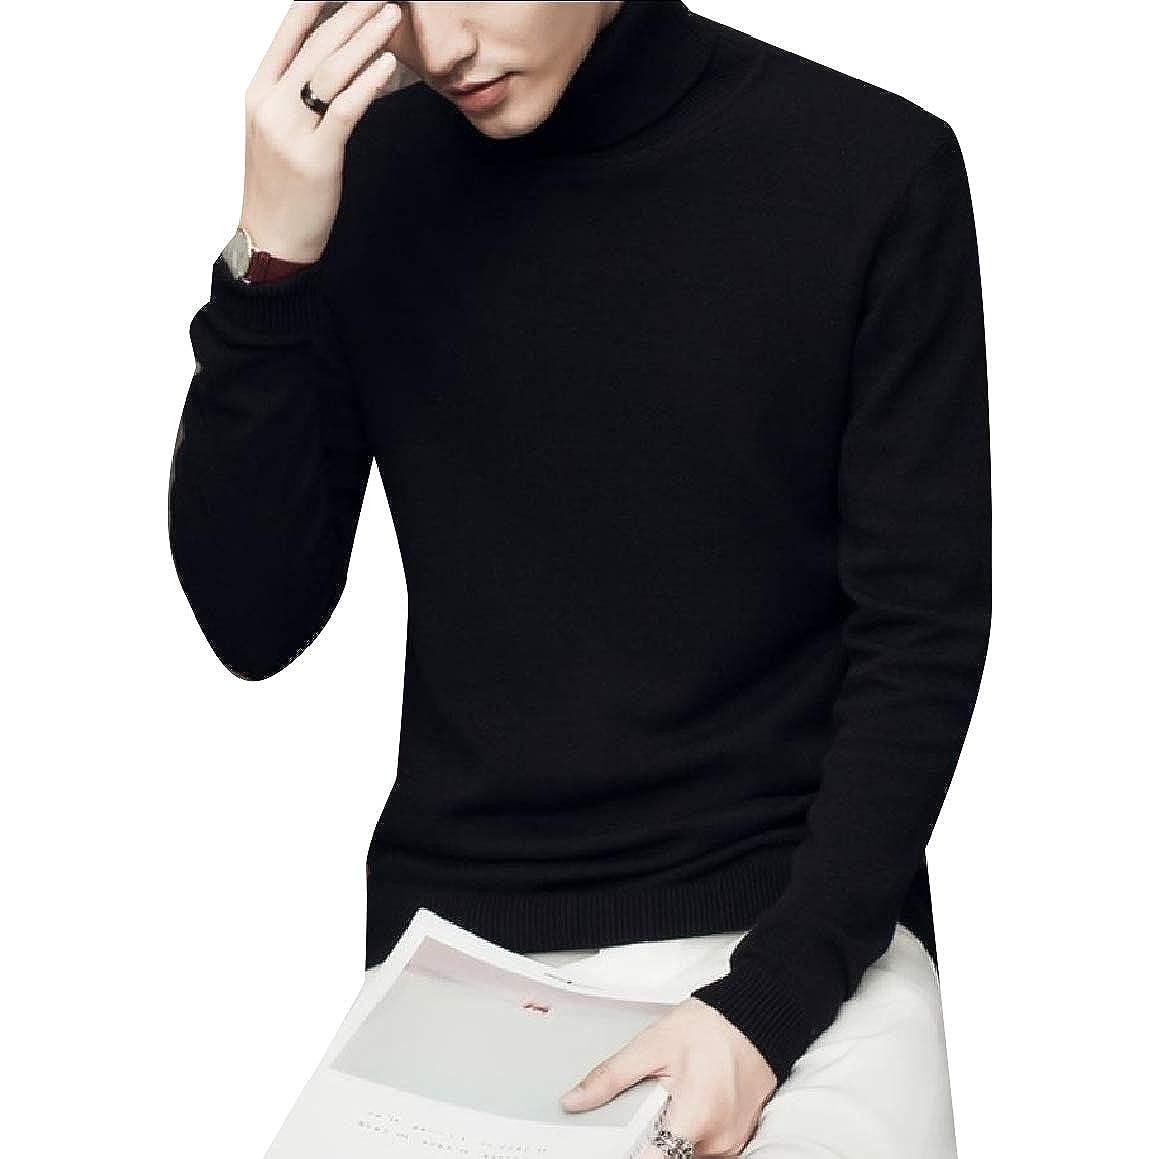 YUNY Men Warm Solid Regular-Fit Knit Turtleneck Comfy Sweater Pullover Black M